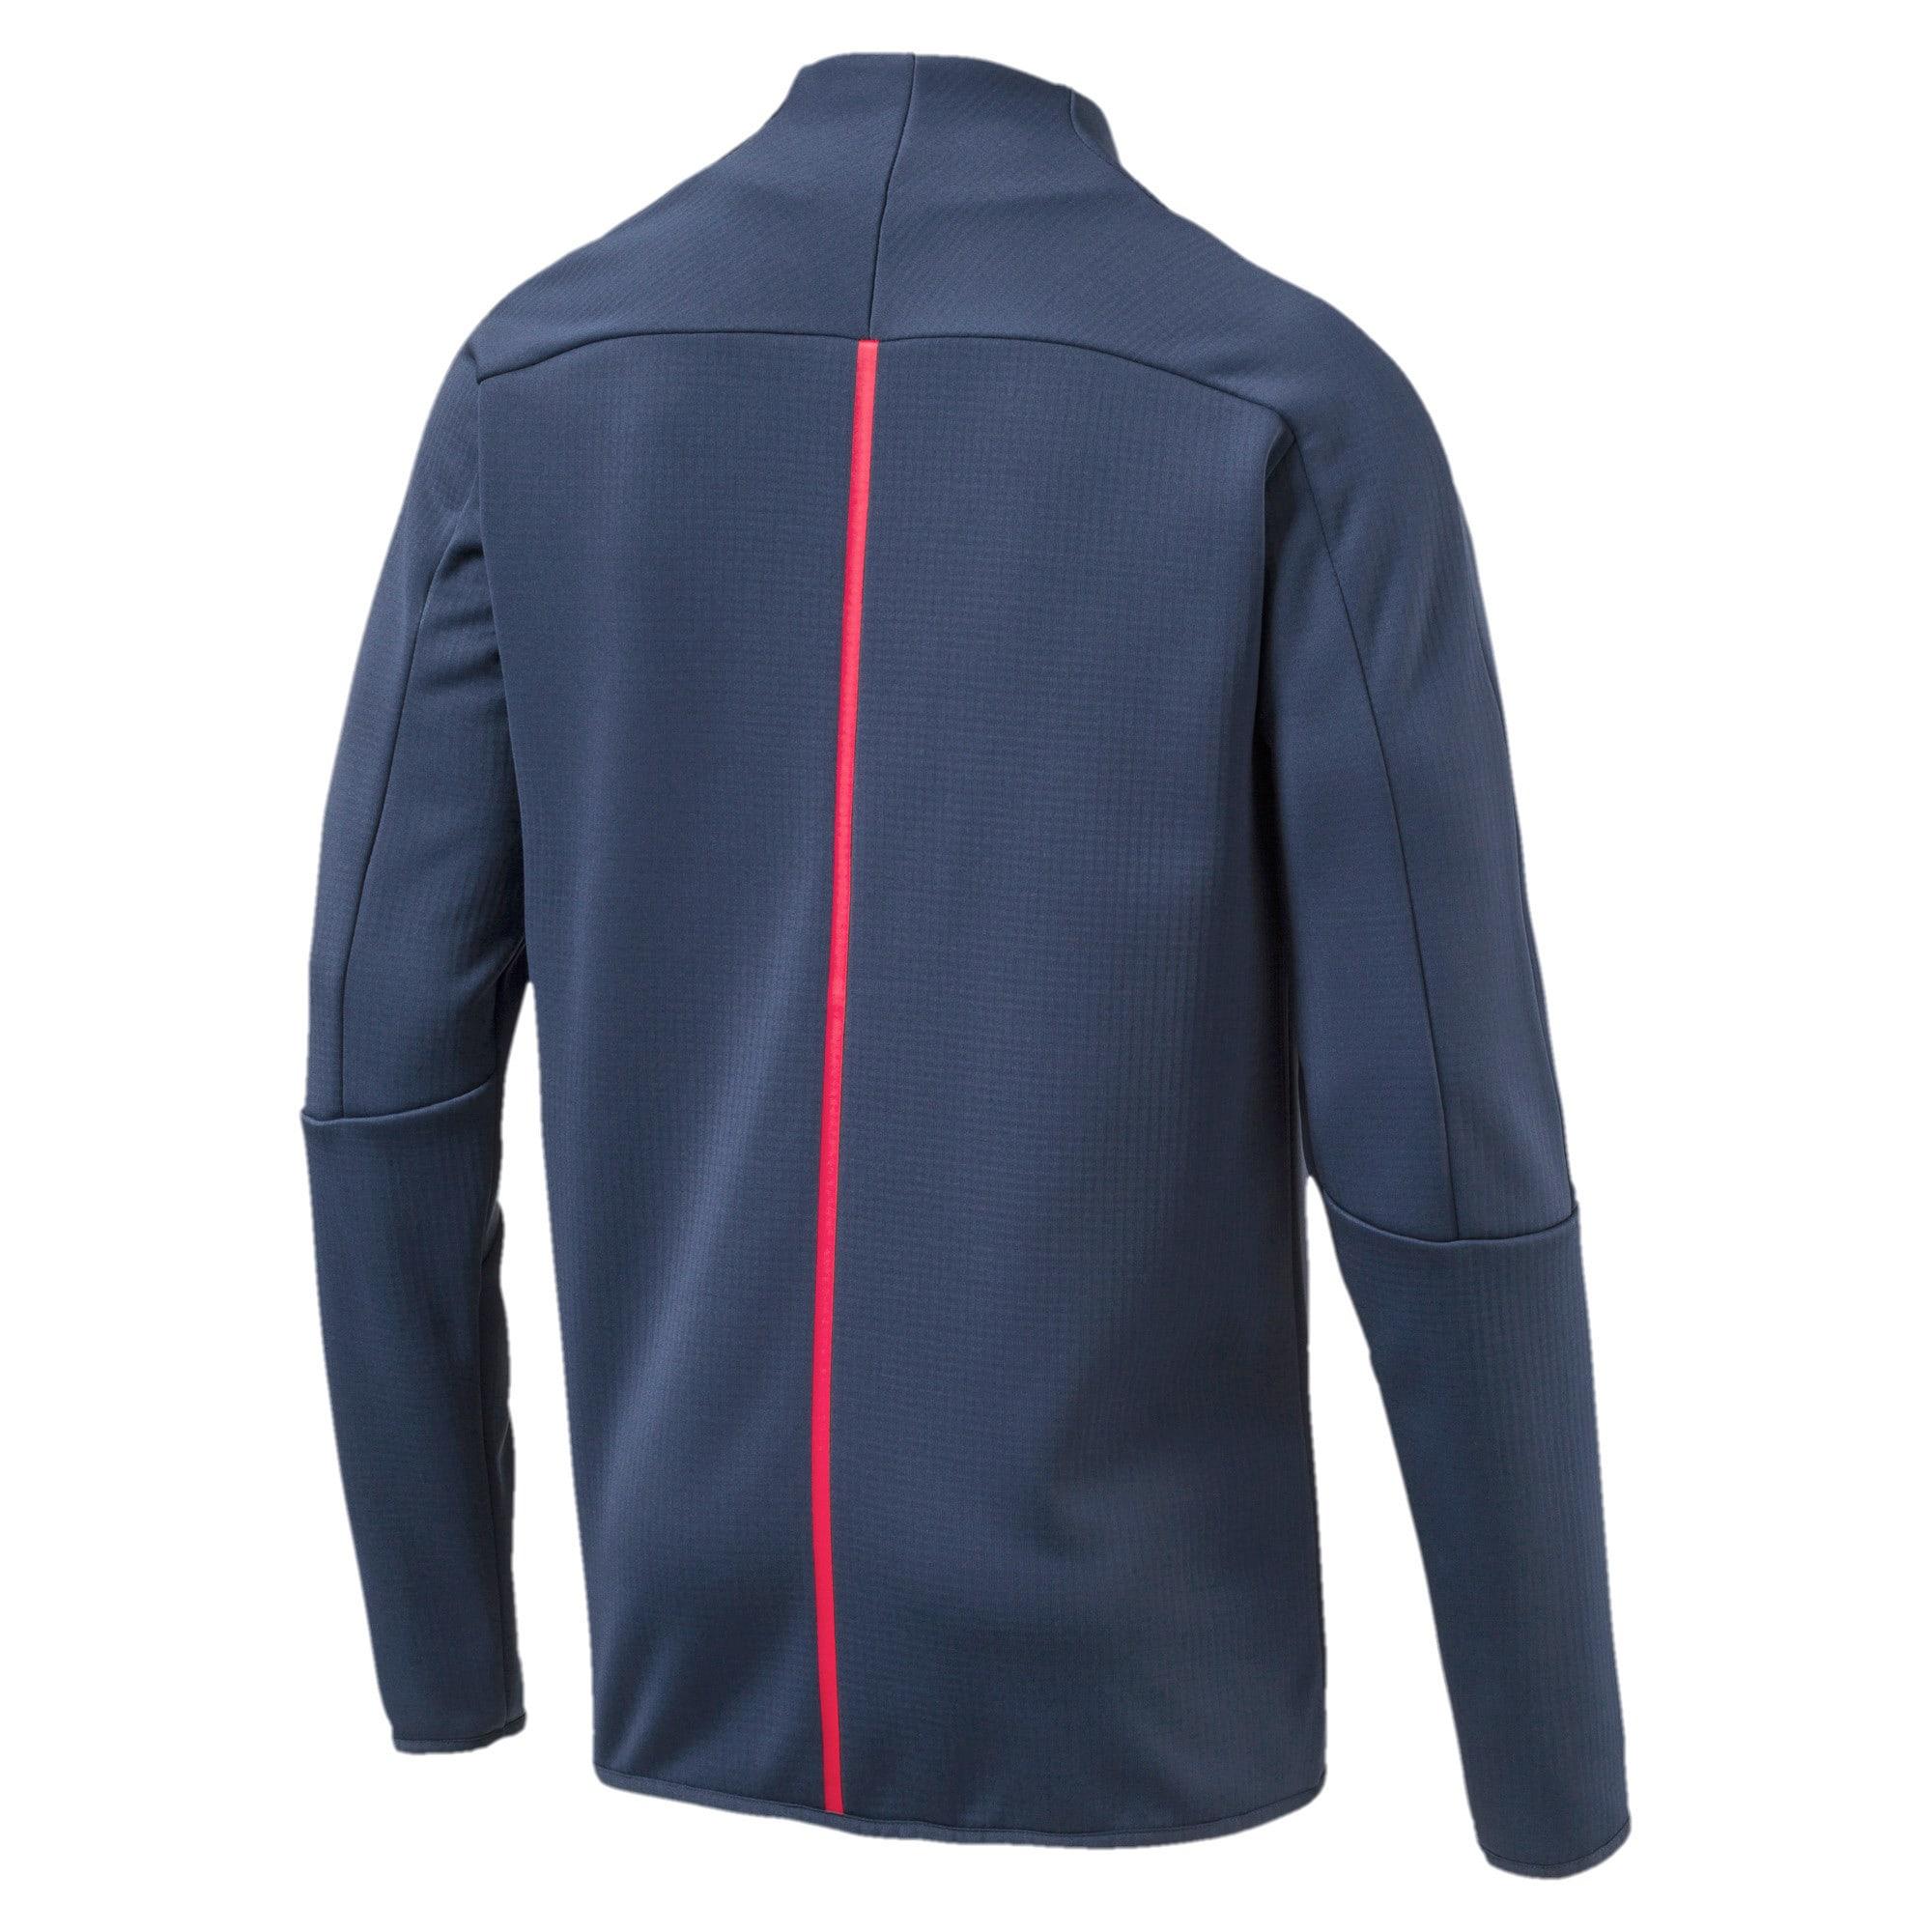 Thumbnail 5 of Ferrari Lifestyle Men's T7 Track Jacket, Sargasso Sea, medium-IND